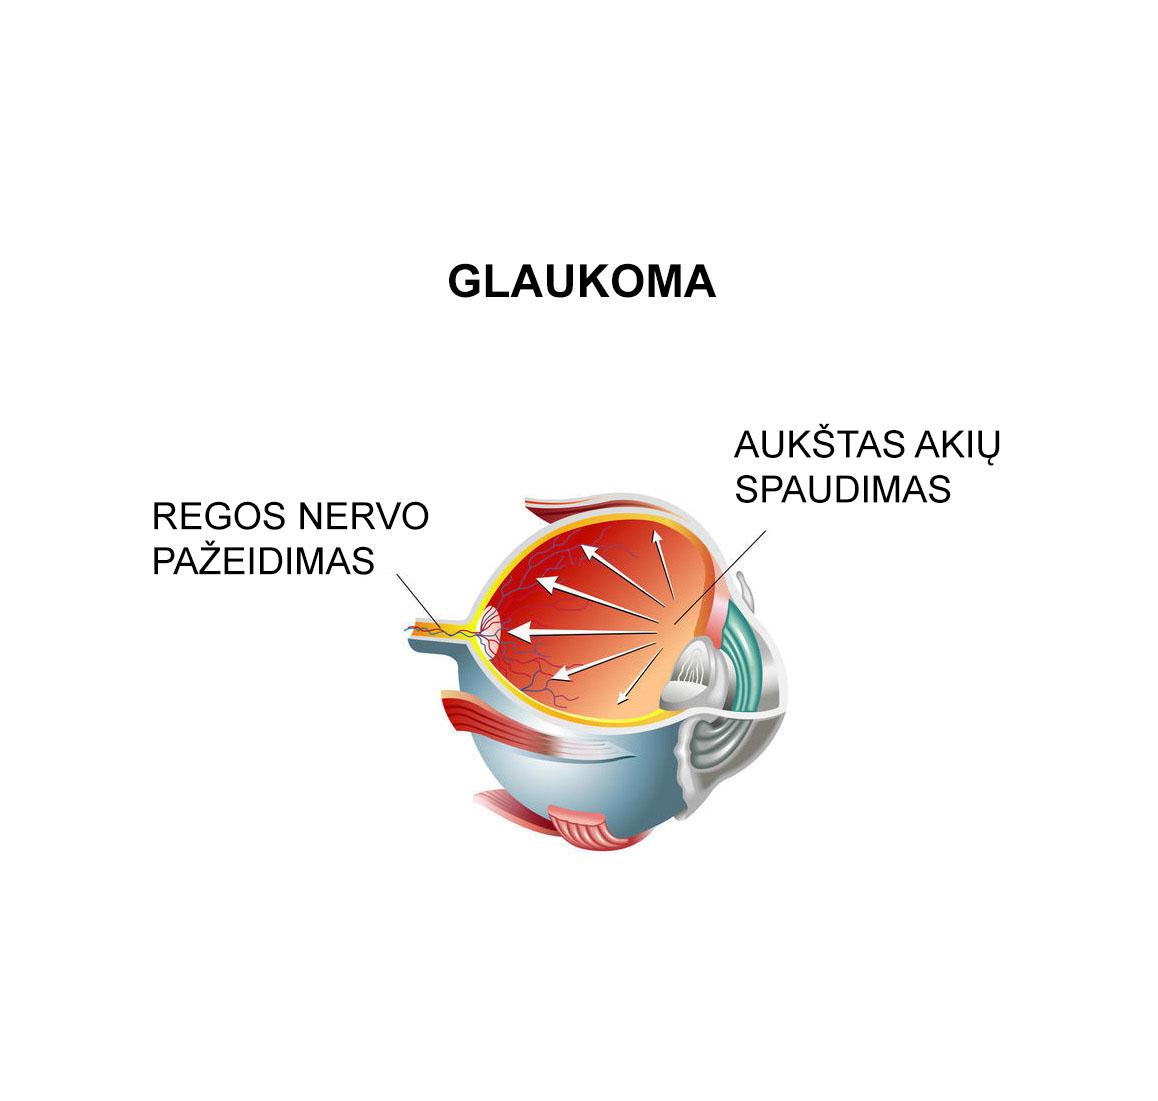 Glaukomos požymiai